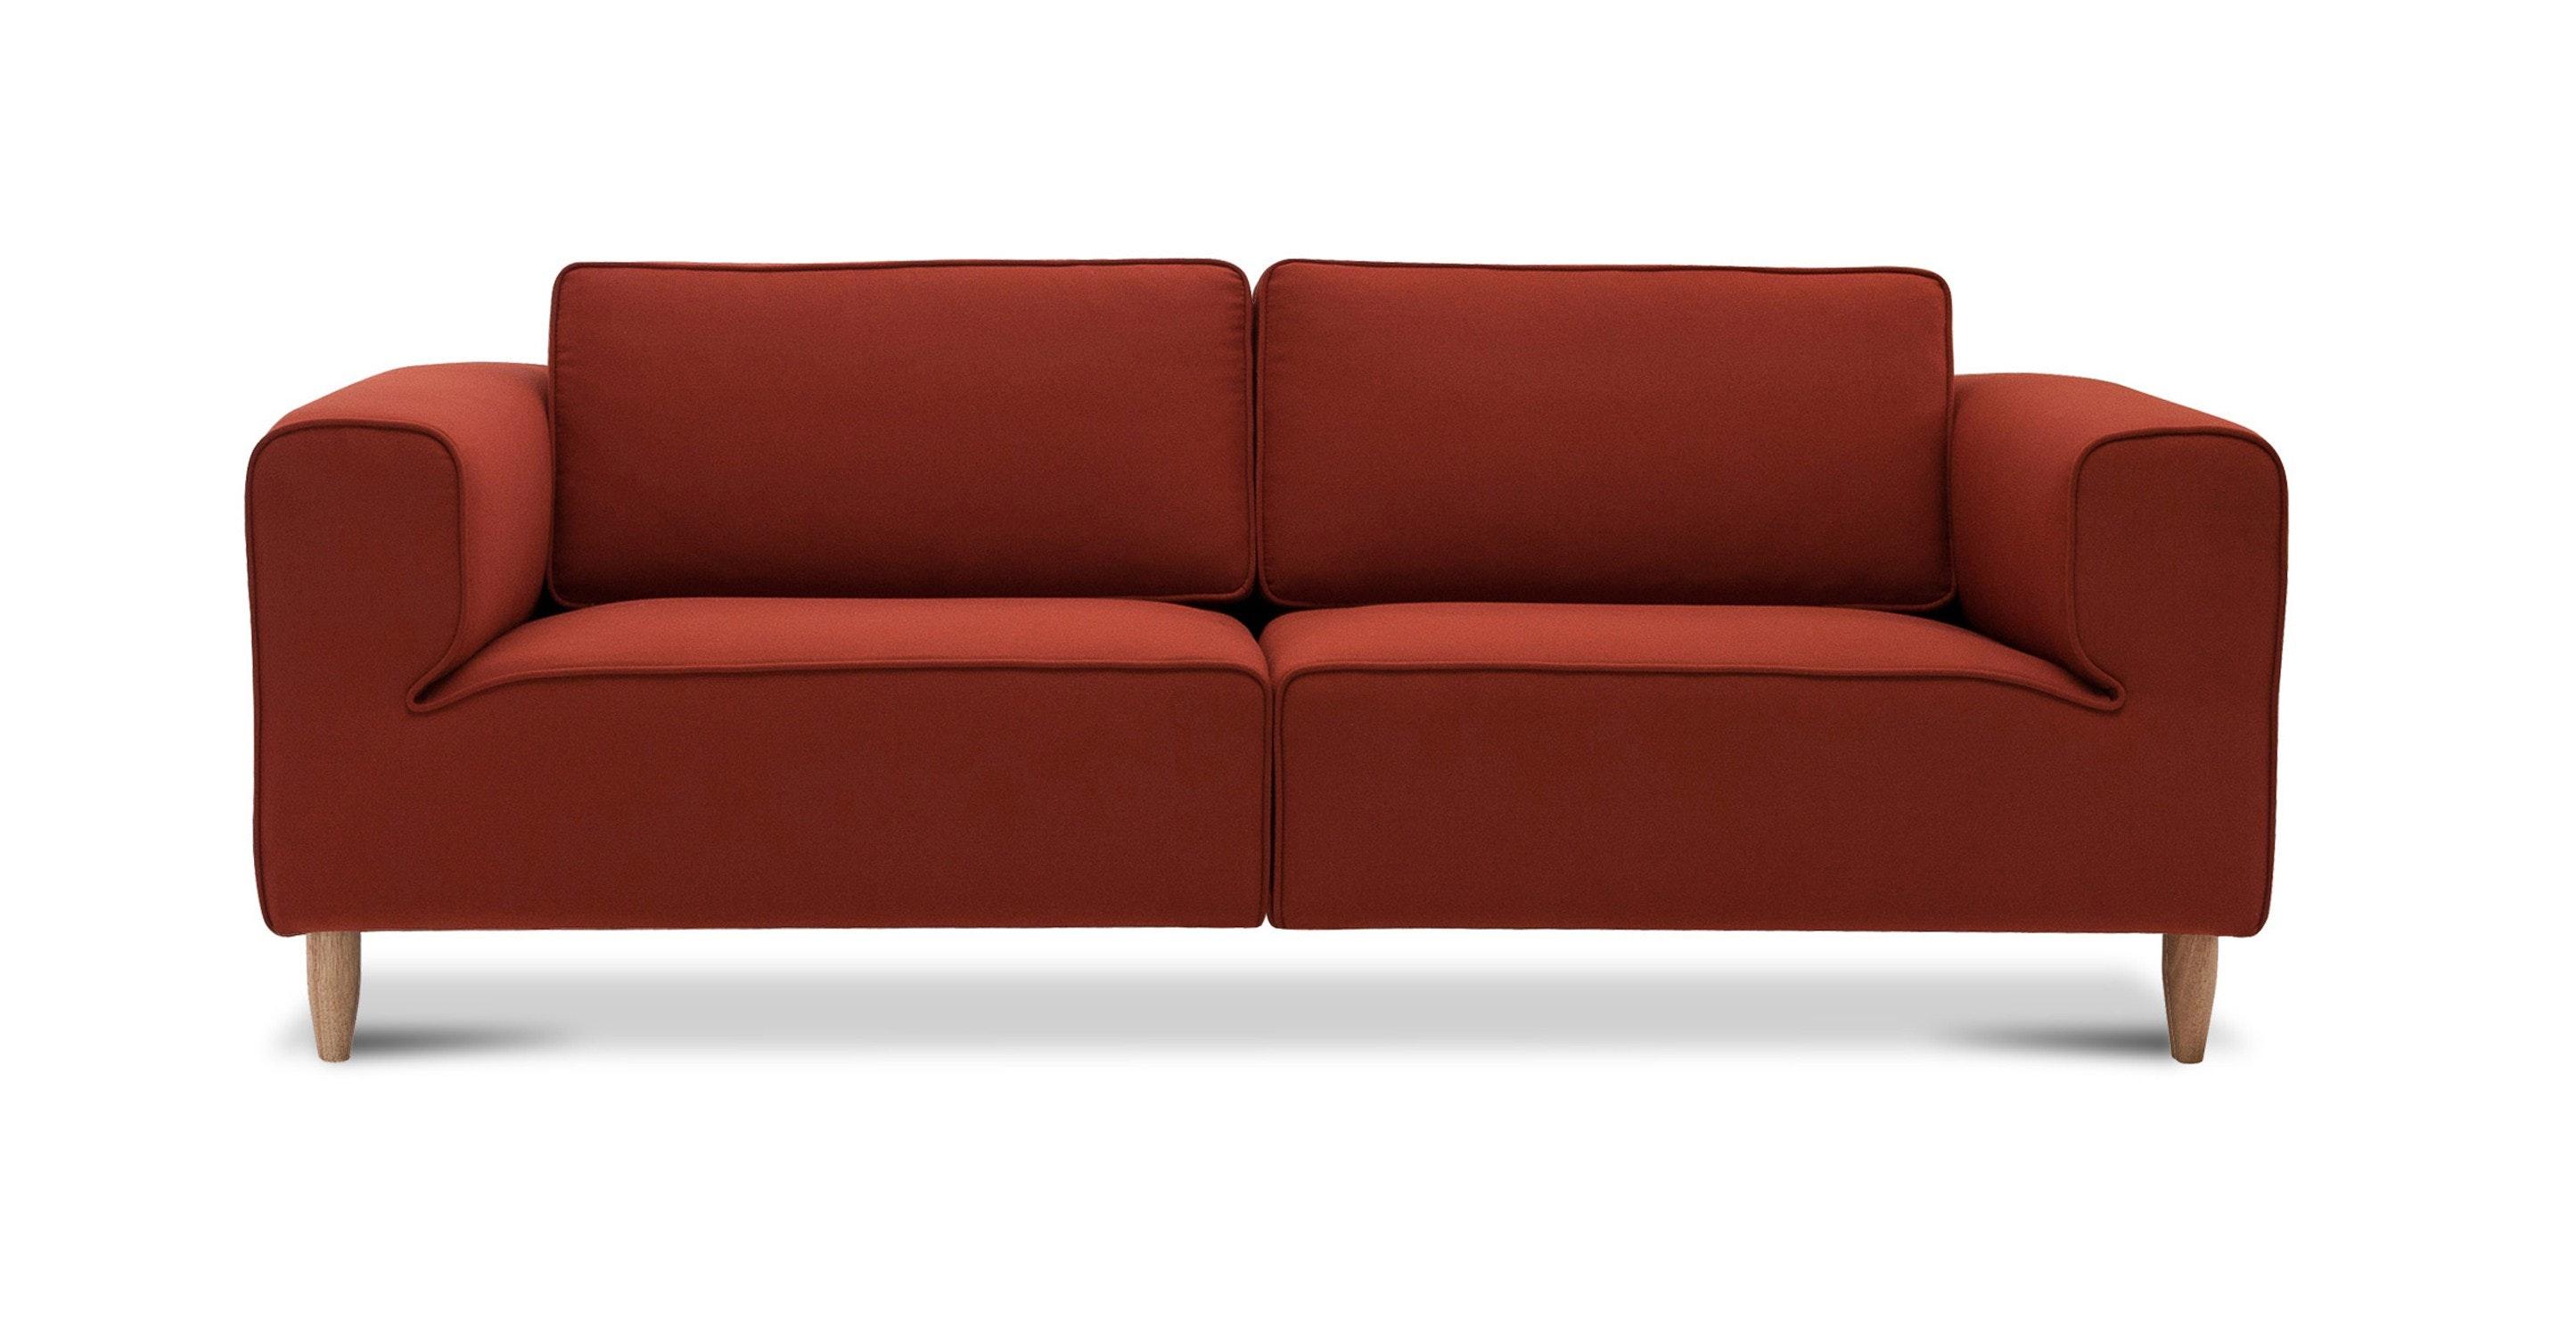 Derby Cinnamon Sofa Sofas Ottomans Article Modern Mid Century And Scandinavian Furniture